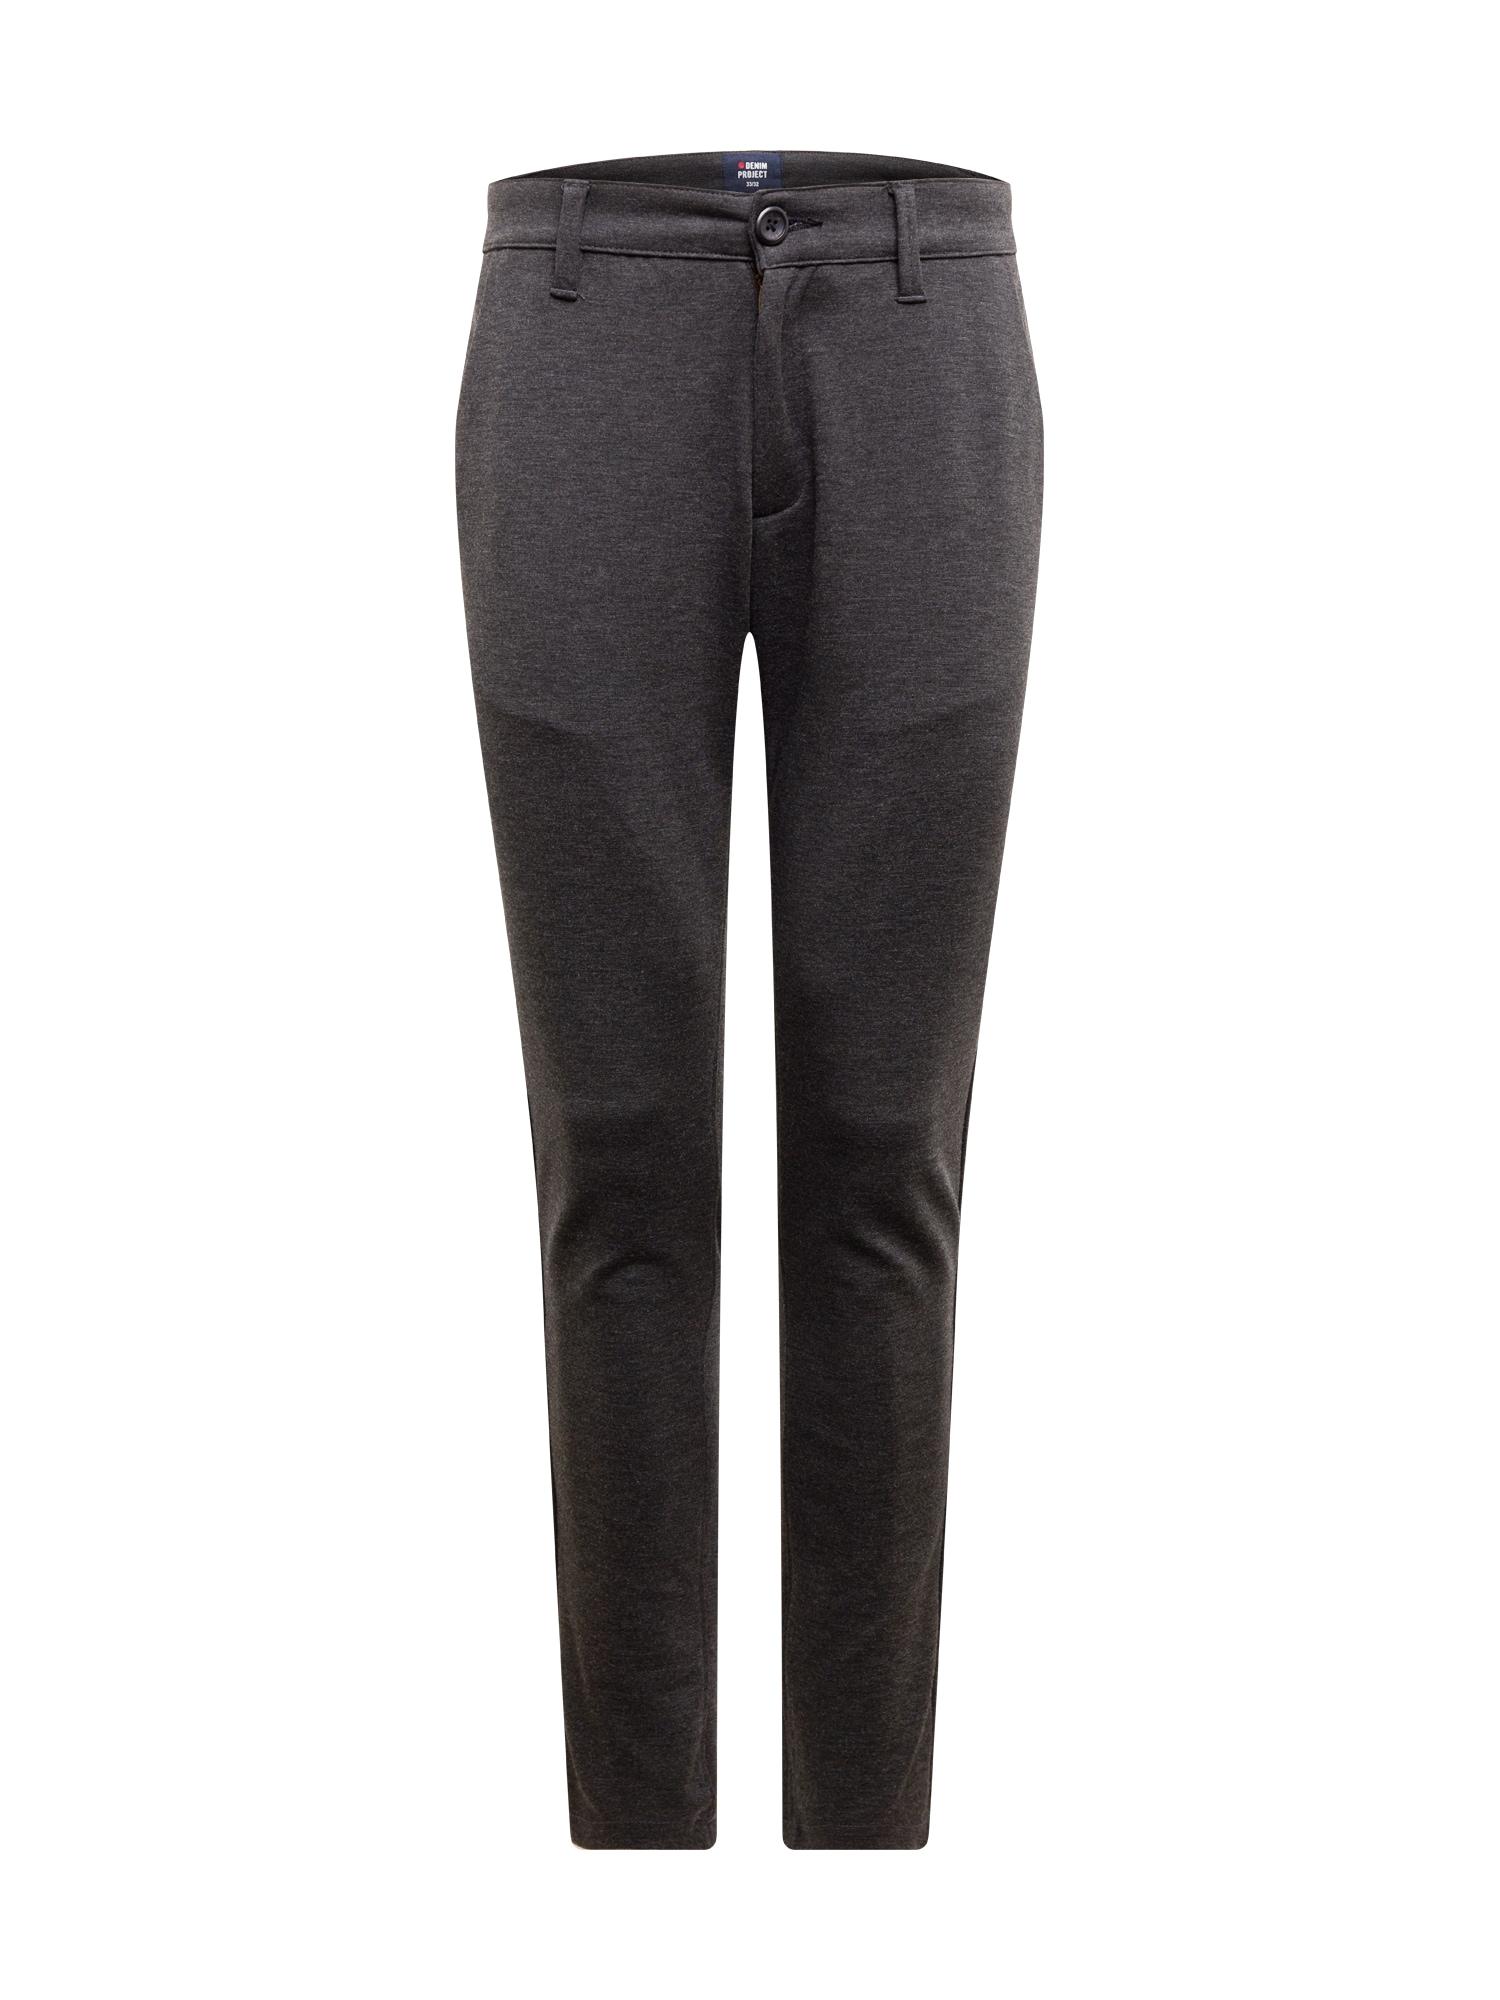 Denim Project Chino kalhoty 'Ponte Roma Plain'  tmavě šedá